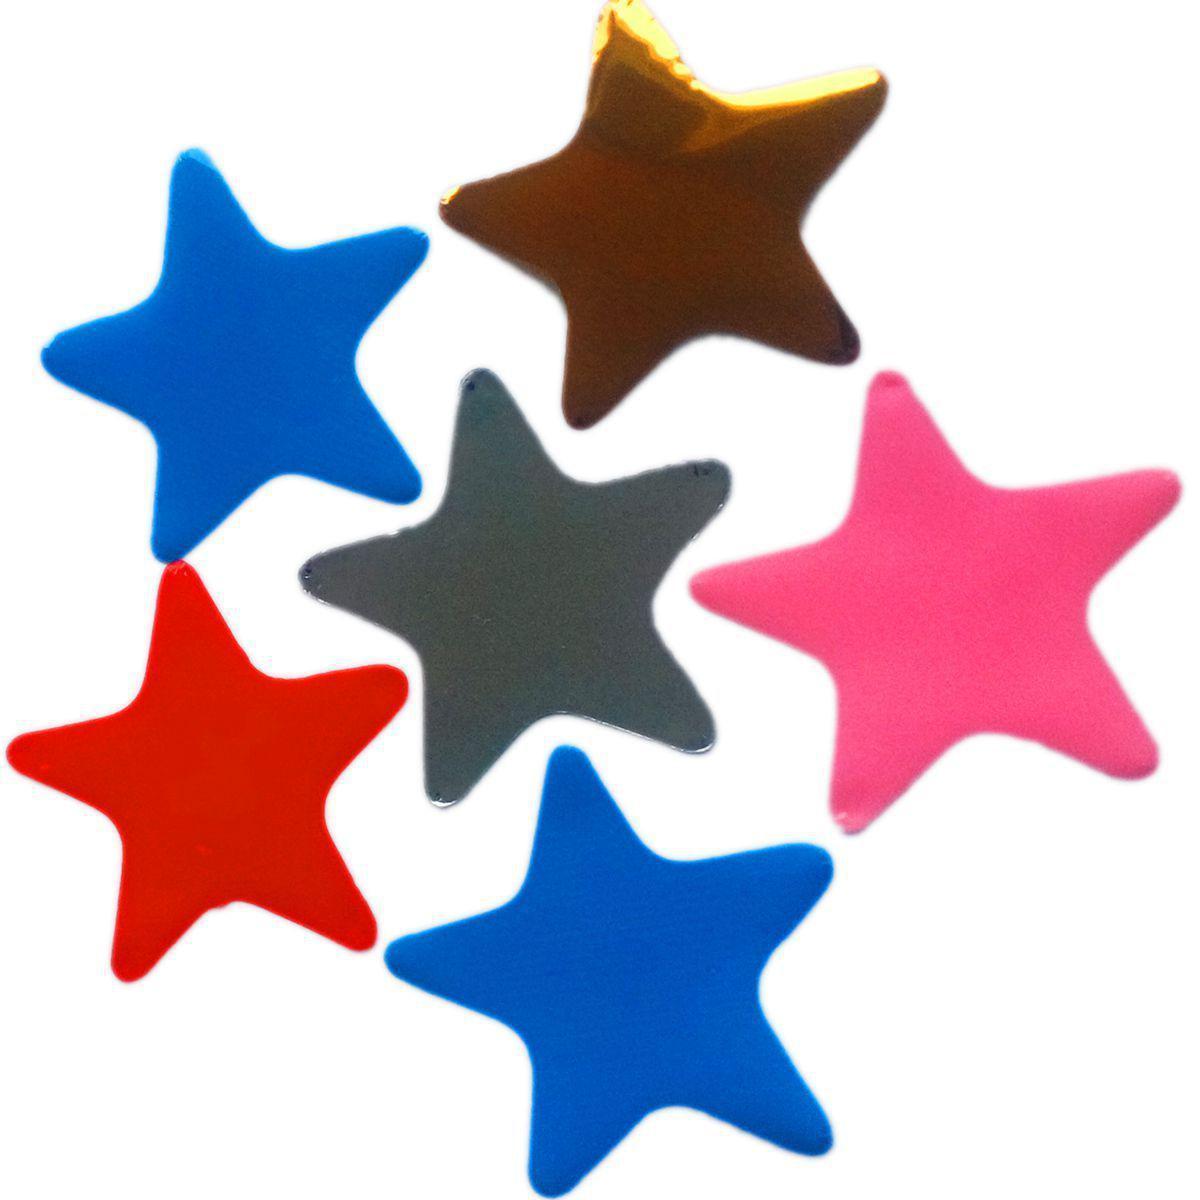 Конфетти звезды ассорти 23мм, 1кг